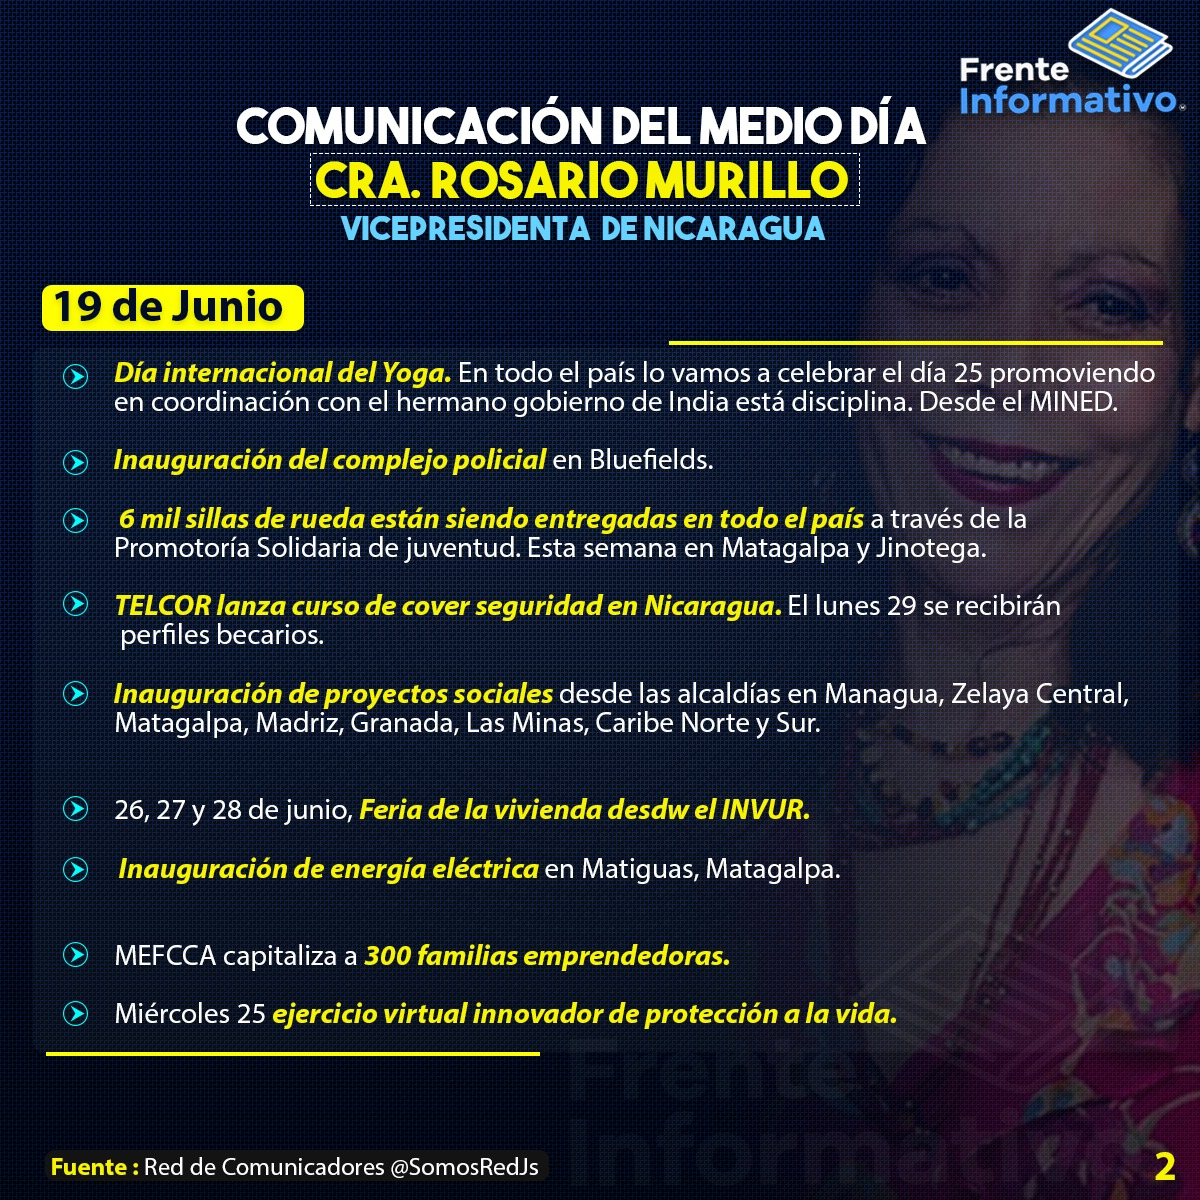 Siempre al frente con el frente.  ❤️🖤  Nicaragua avanza. #Nicaragua  #NicaraguaLinda  #Nicaraguasandinista #NicaraguaQuierePaz https://t.co/d7VxNyqUZR